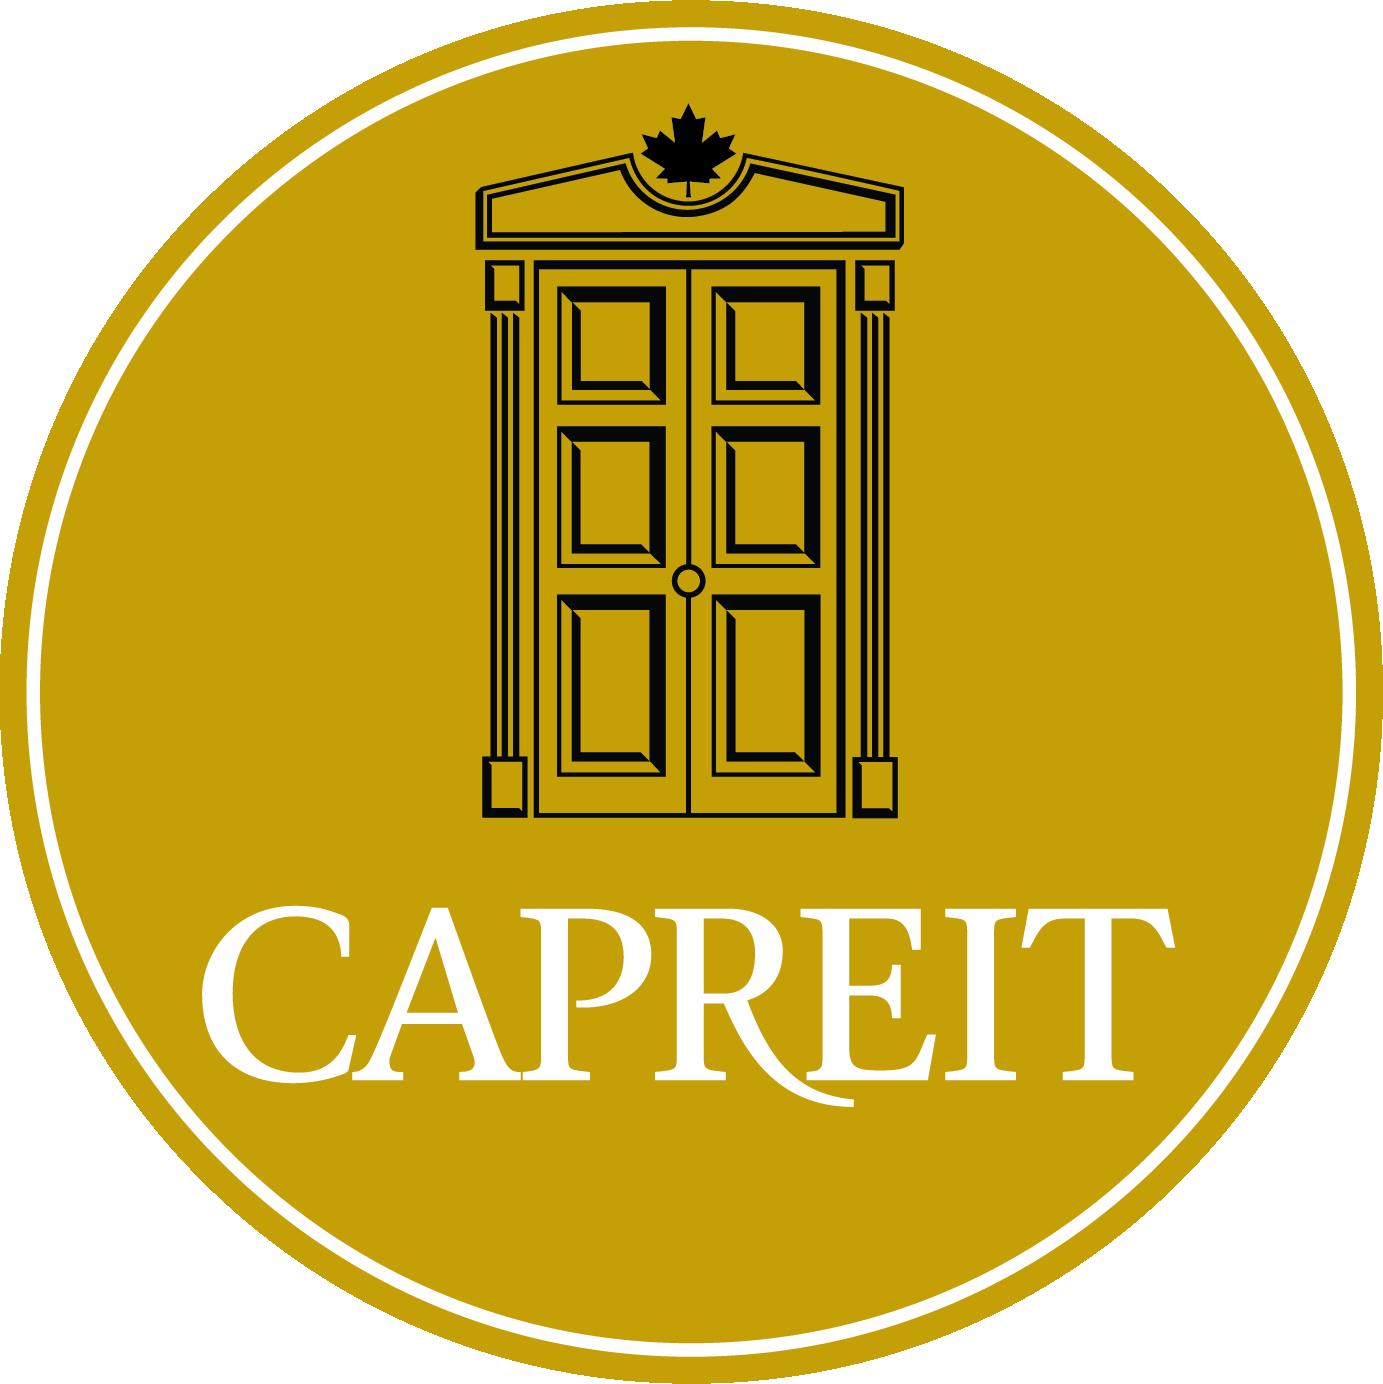 2021 01 Capreit Logo 1 Png